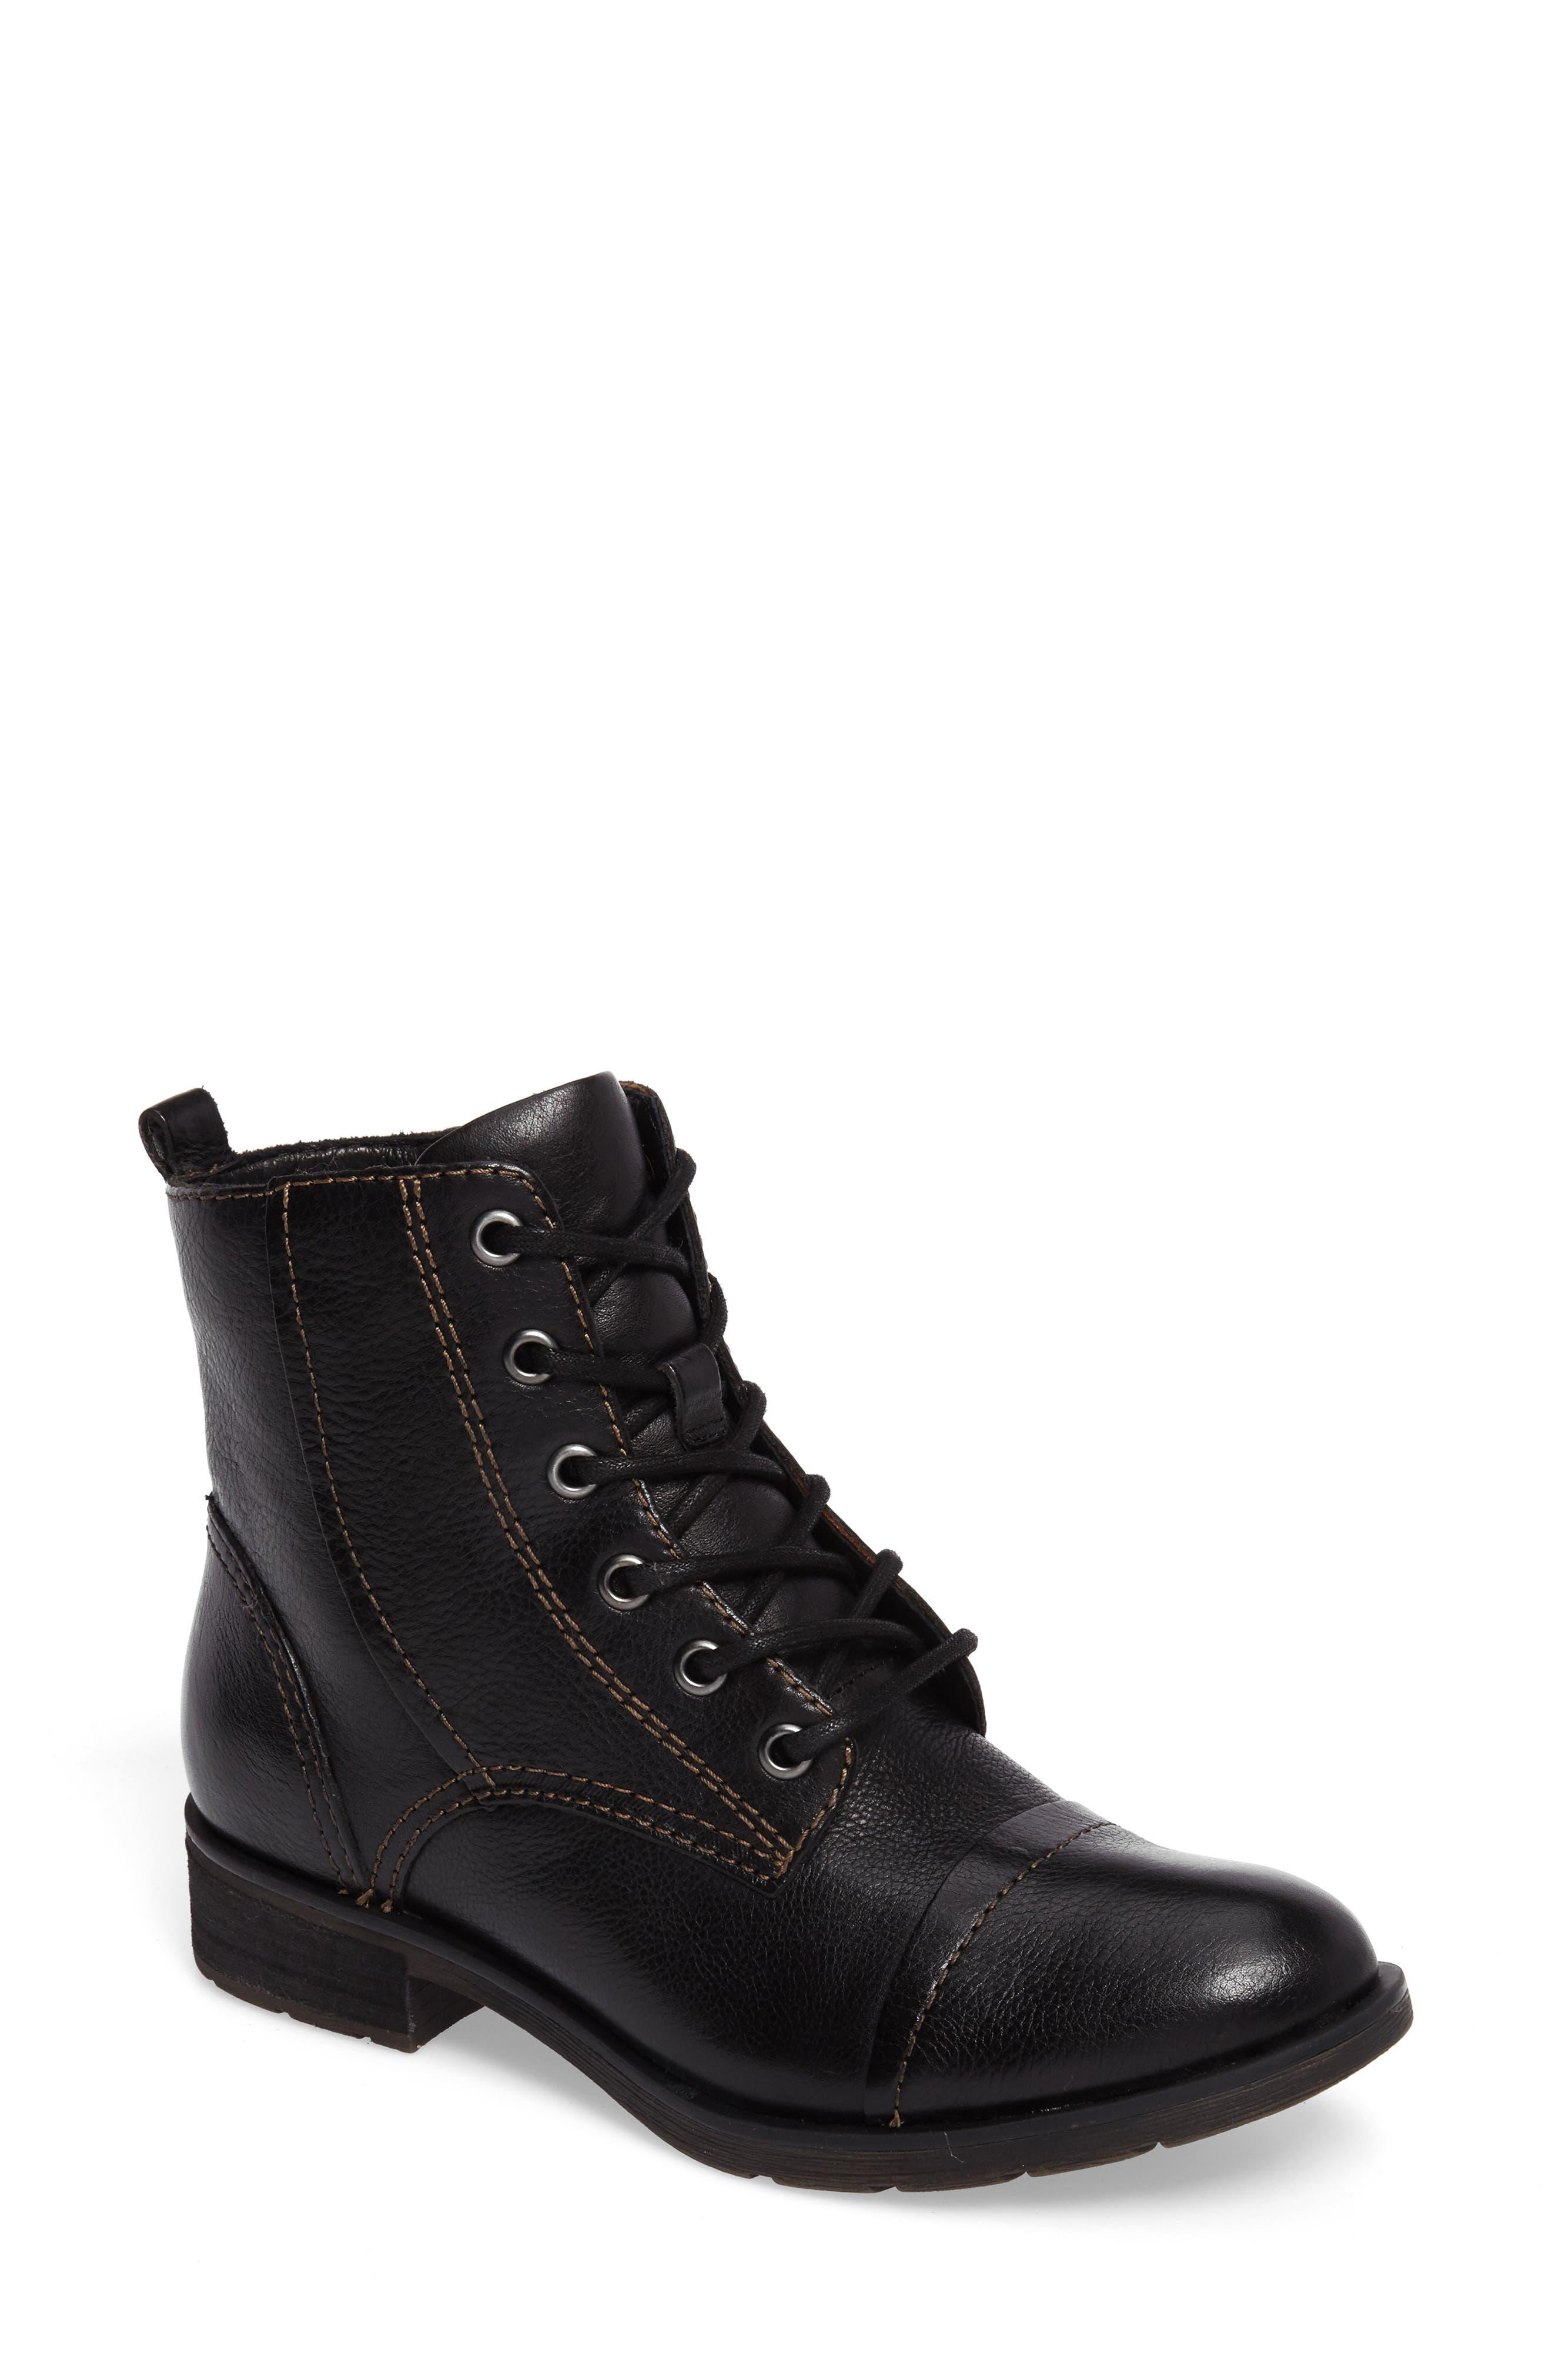 Alternate Image 1 Selected - Söfft Belton Cap Toe Combat Boot (Women)